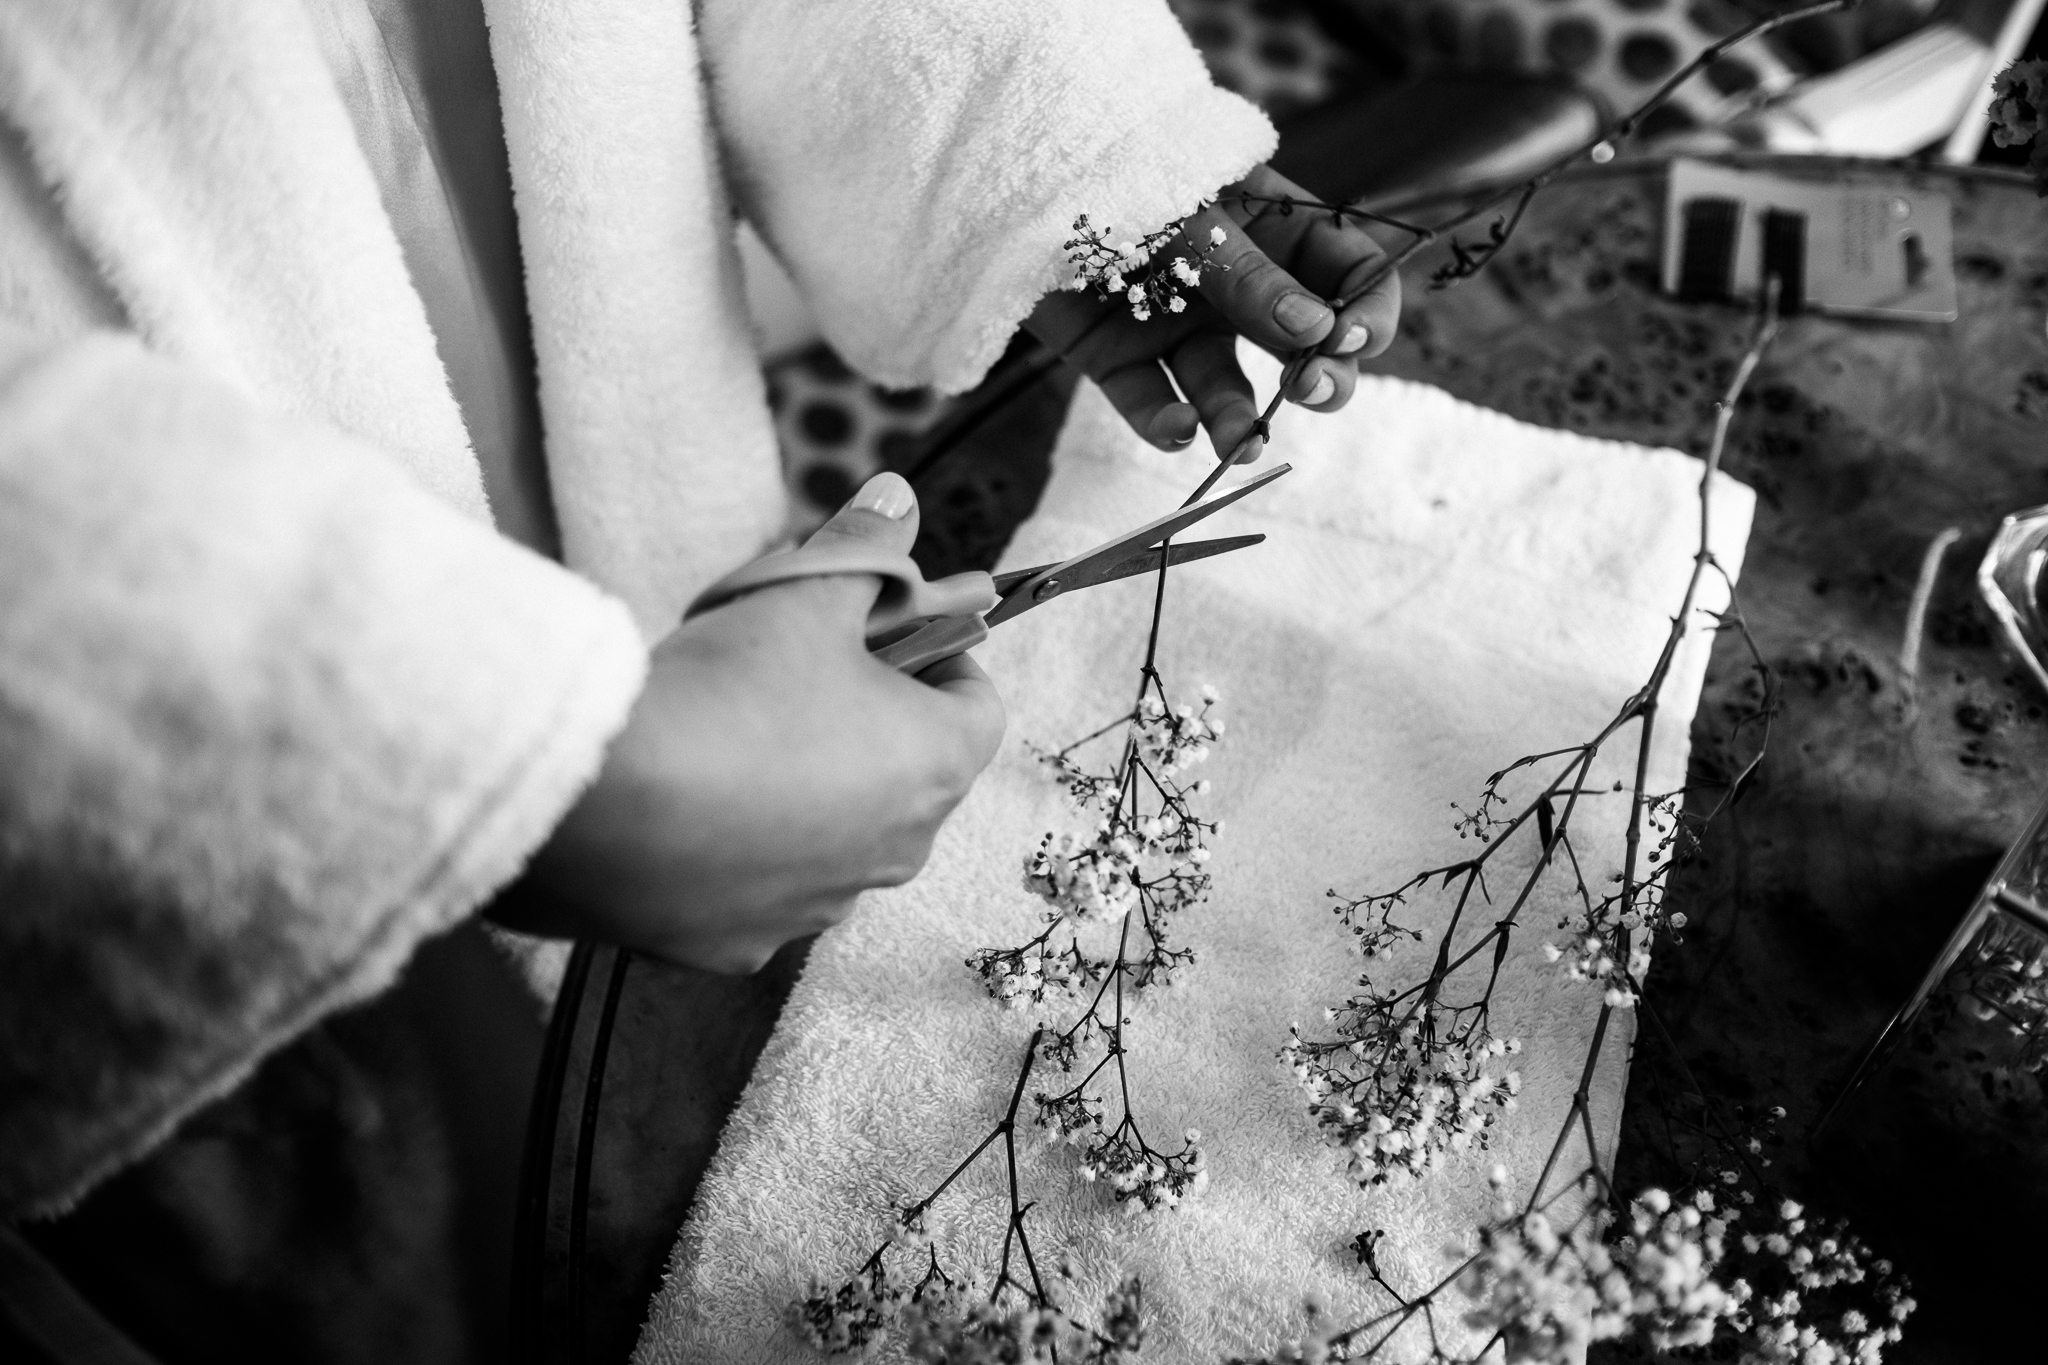 Relaxed Documentary Wedding Photography at The Wizard Inn, Alderley Edge Cheshire - Jenny Harper-3.jpg